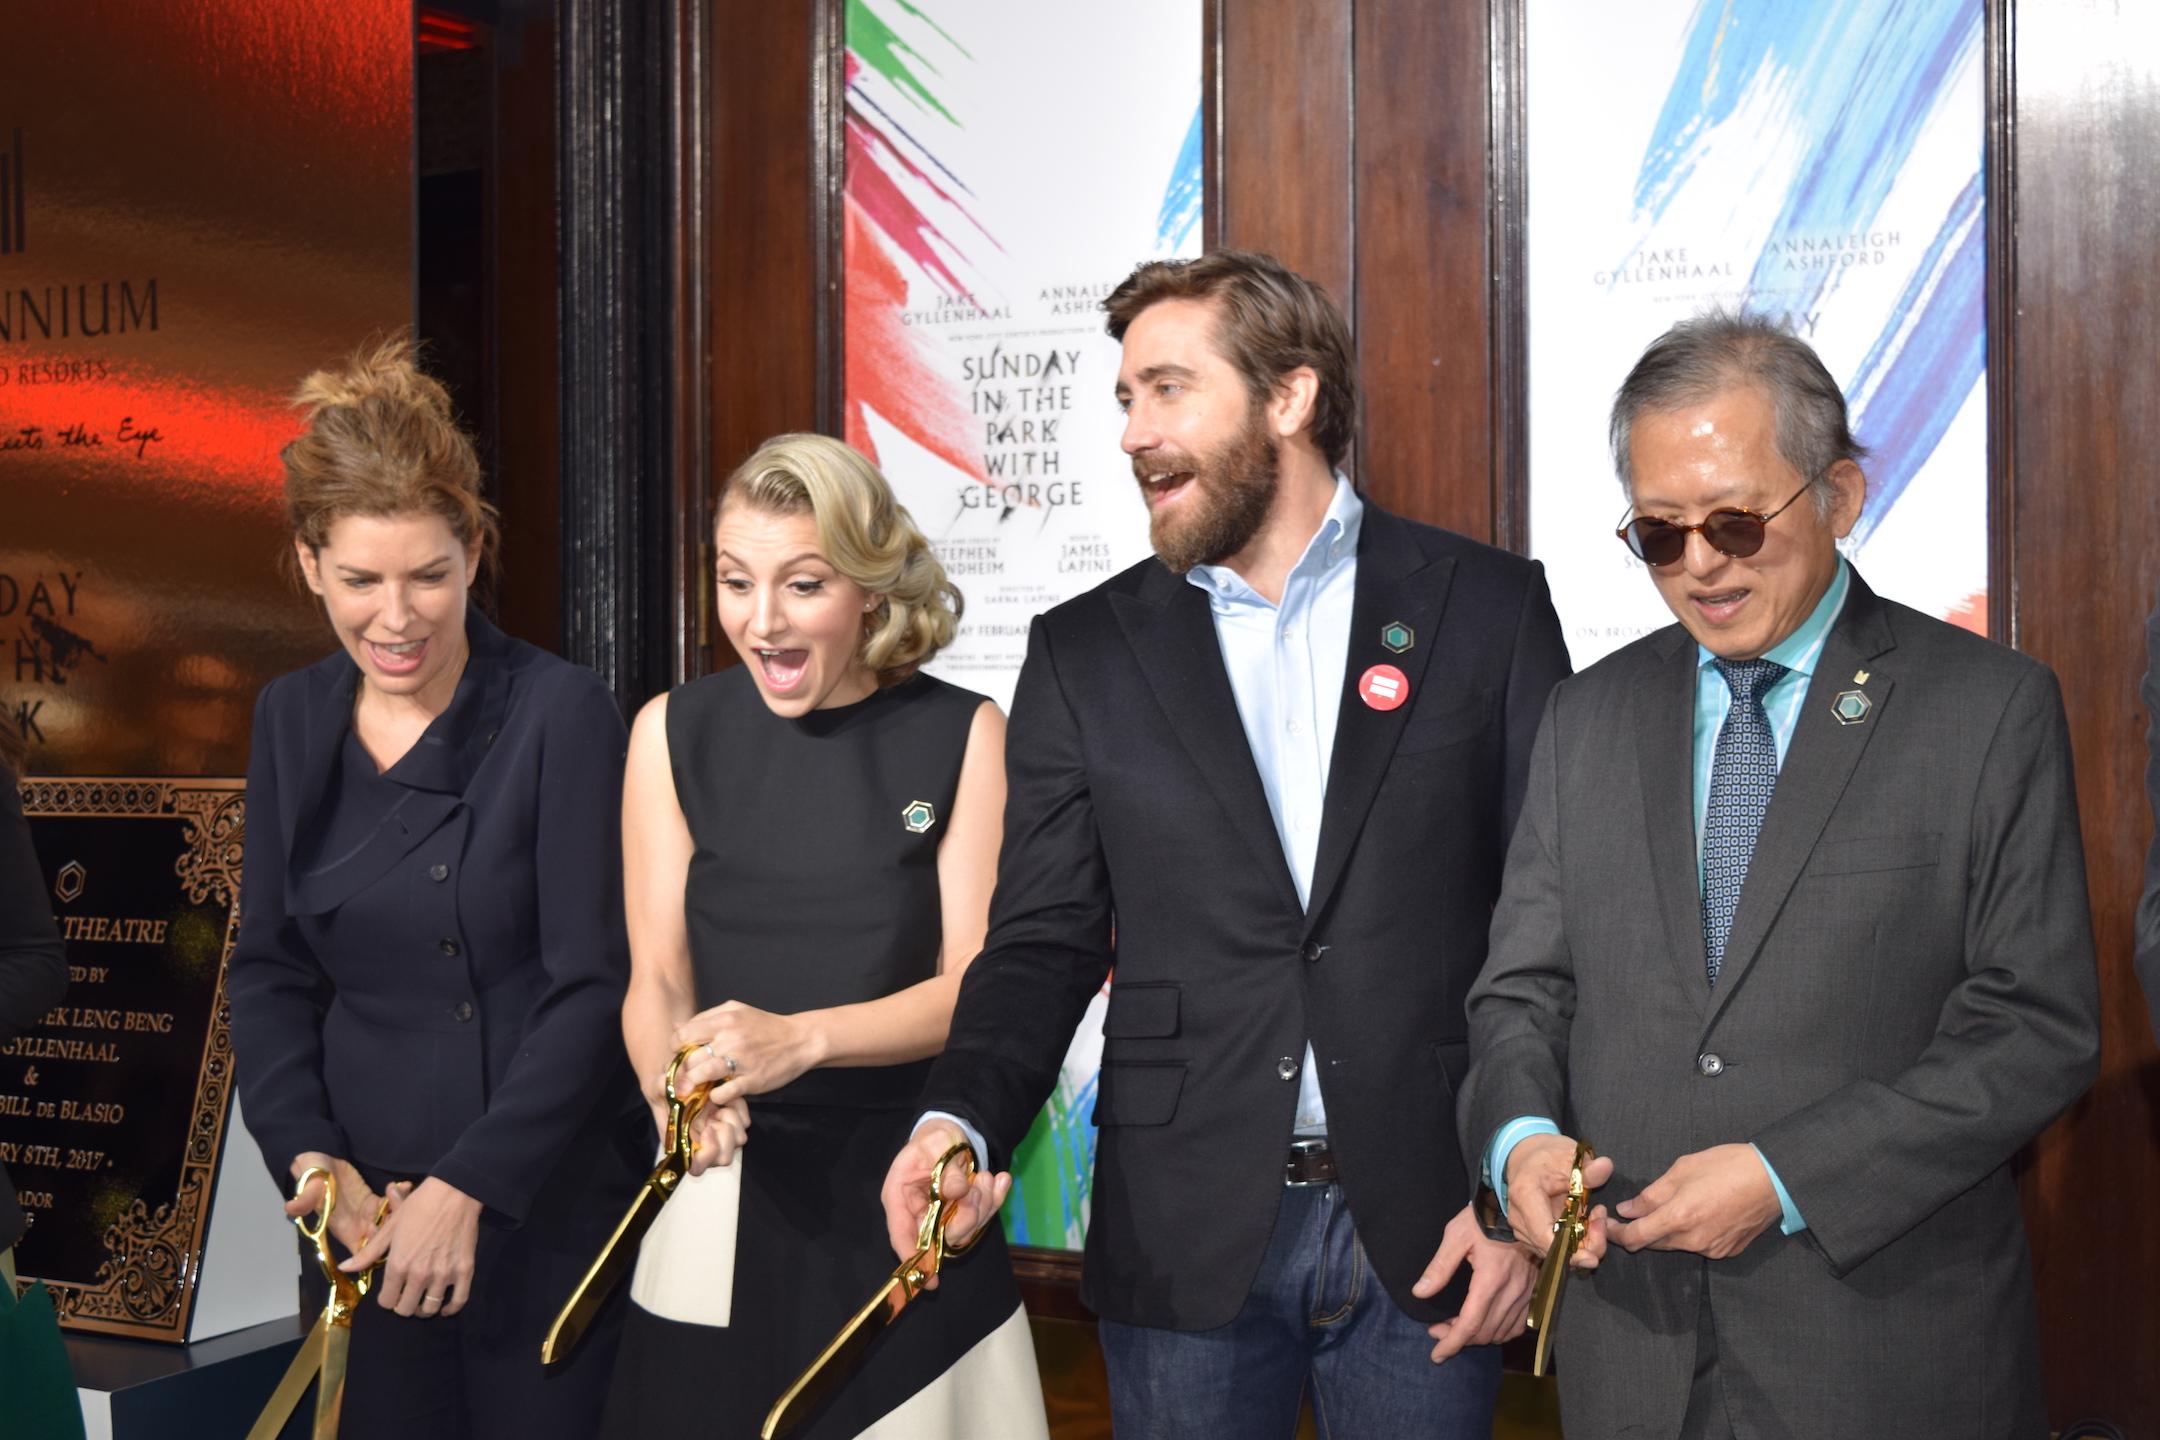 Jake Gyllenhaal & Annaleigh Ashford Cut the Ribbon at Hudson Theatre